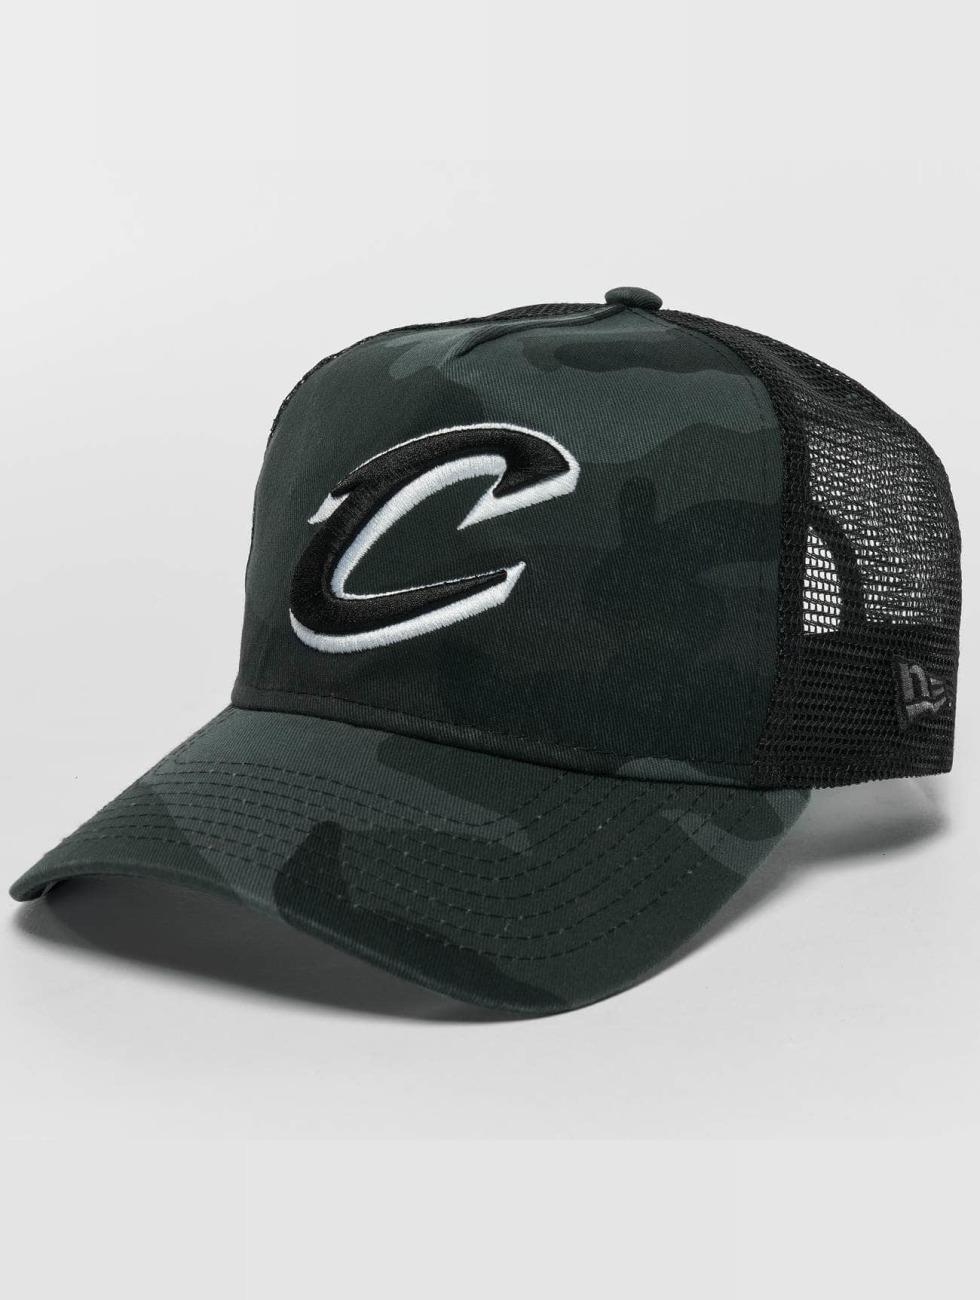 New Era Trucker Cap Washed Camo Cleveland Cavaliers Trucker Cap camouflage